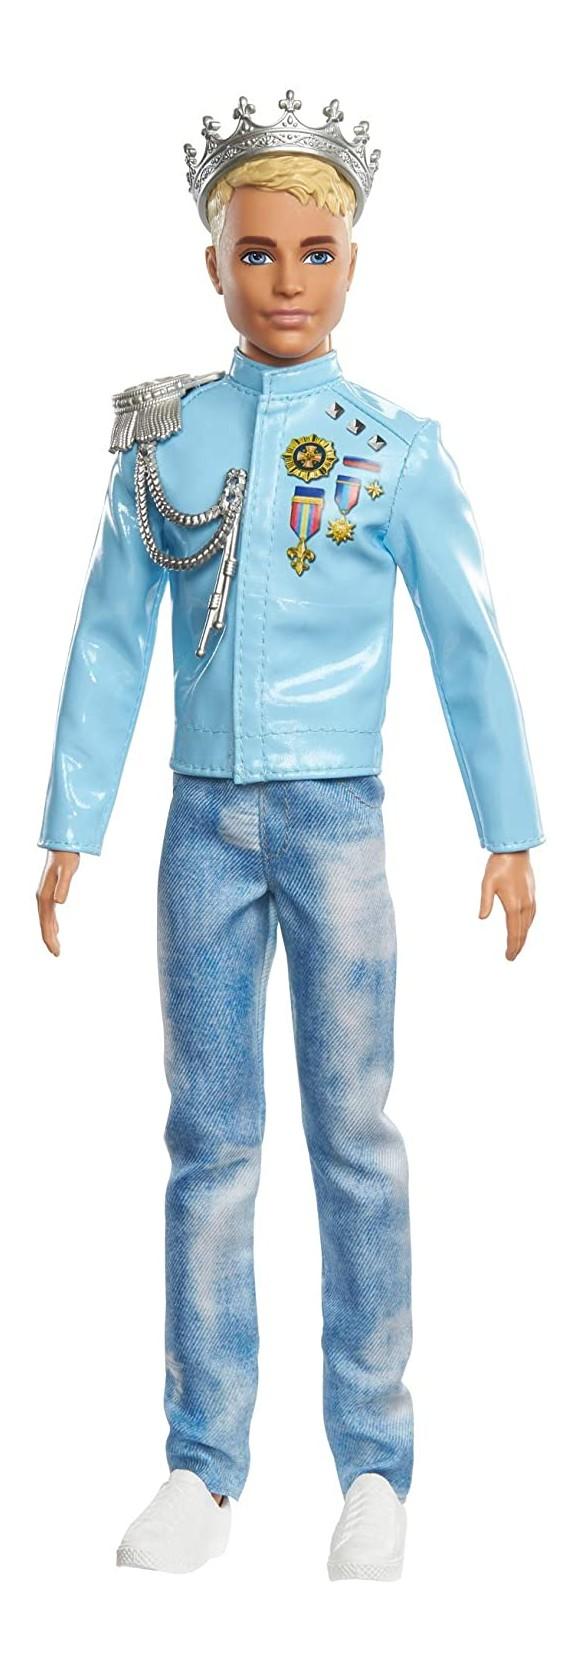 Barbie - Princess Adventure - Prins Ken